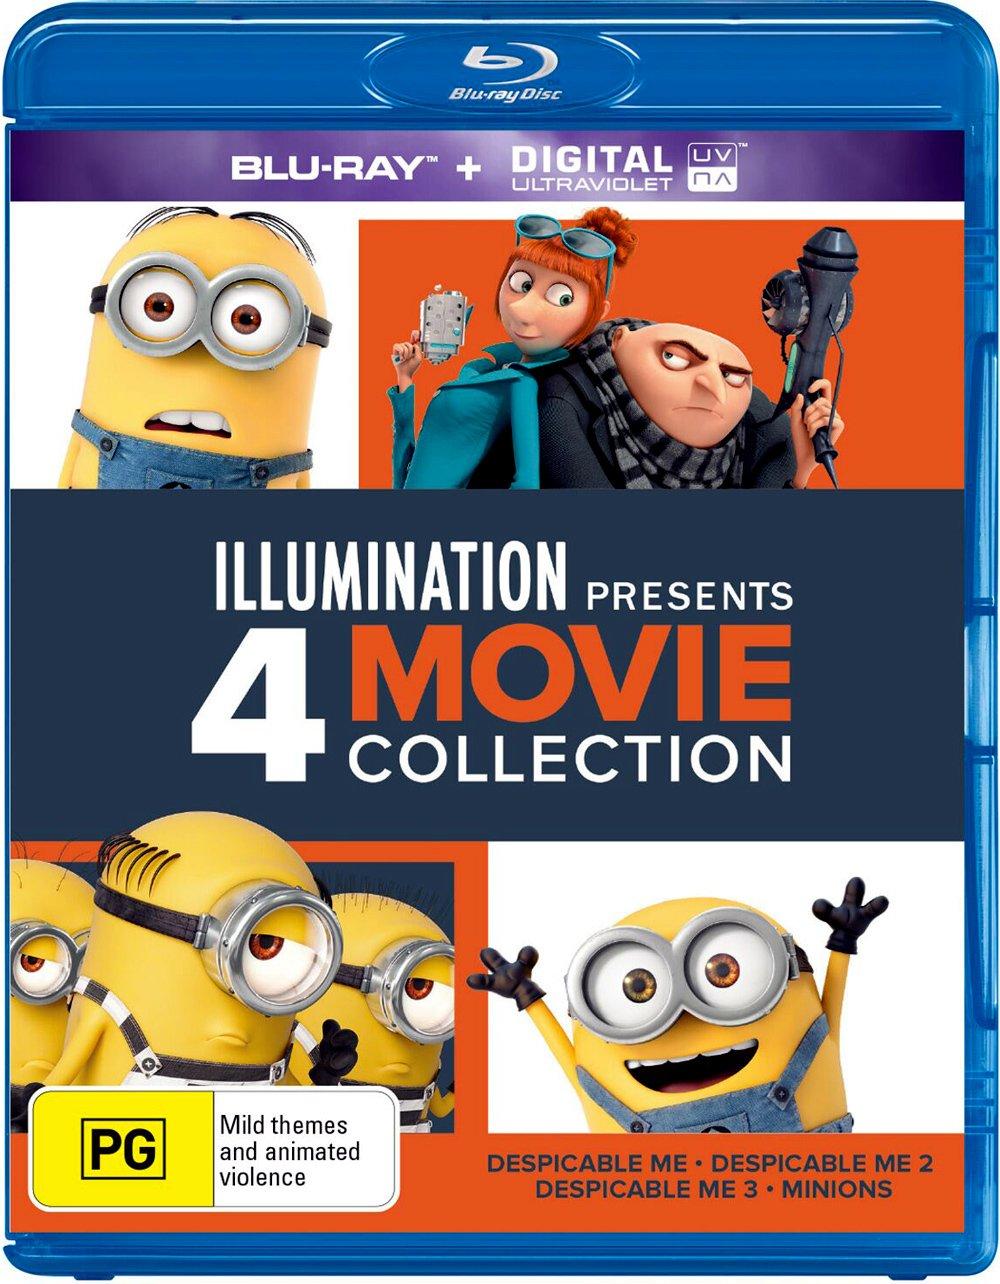 Despicable Me 4 Movie Collection (2010-2017) Dual Audio [Hindi + English] | x264 | x265 10bit HEVC Bluray | 1080p | 720p